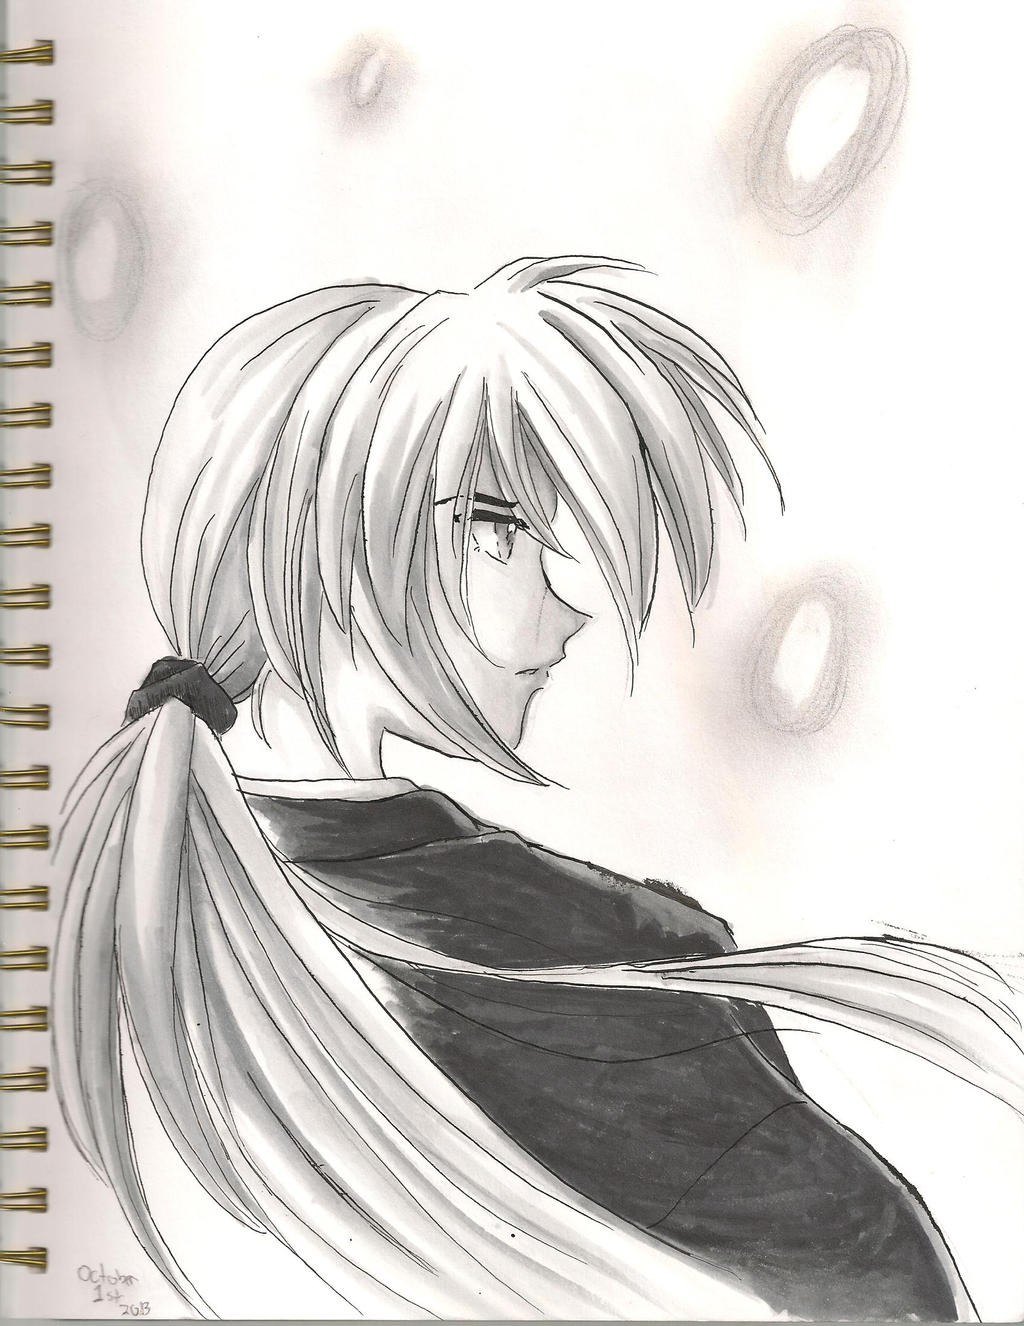 Kenshin by Ashirogi28